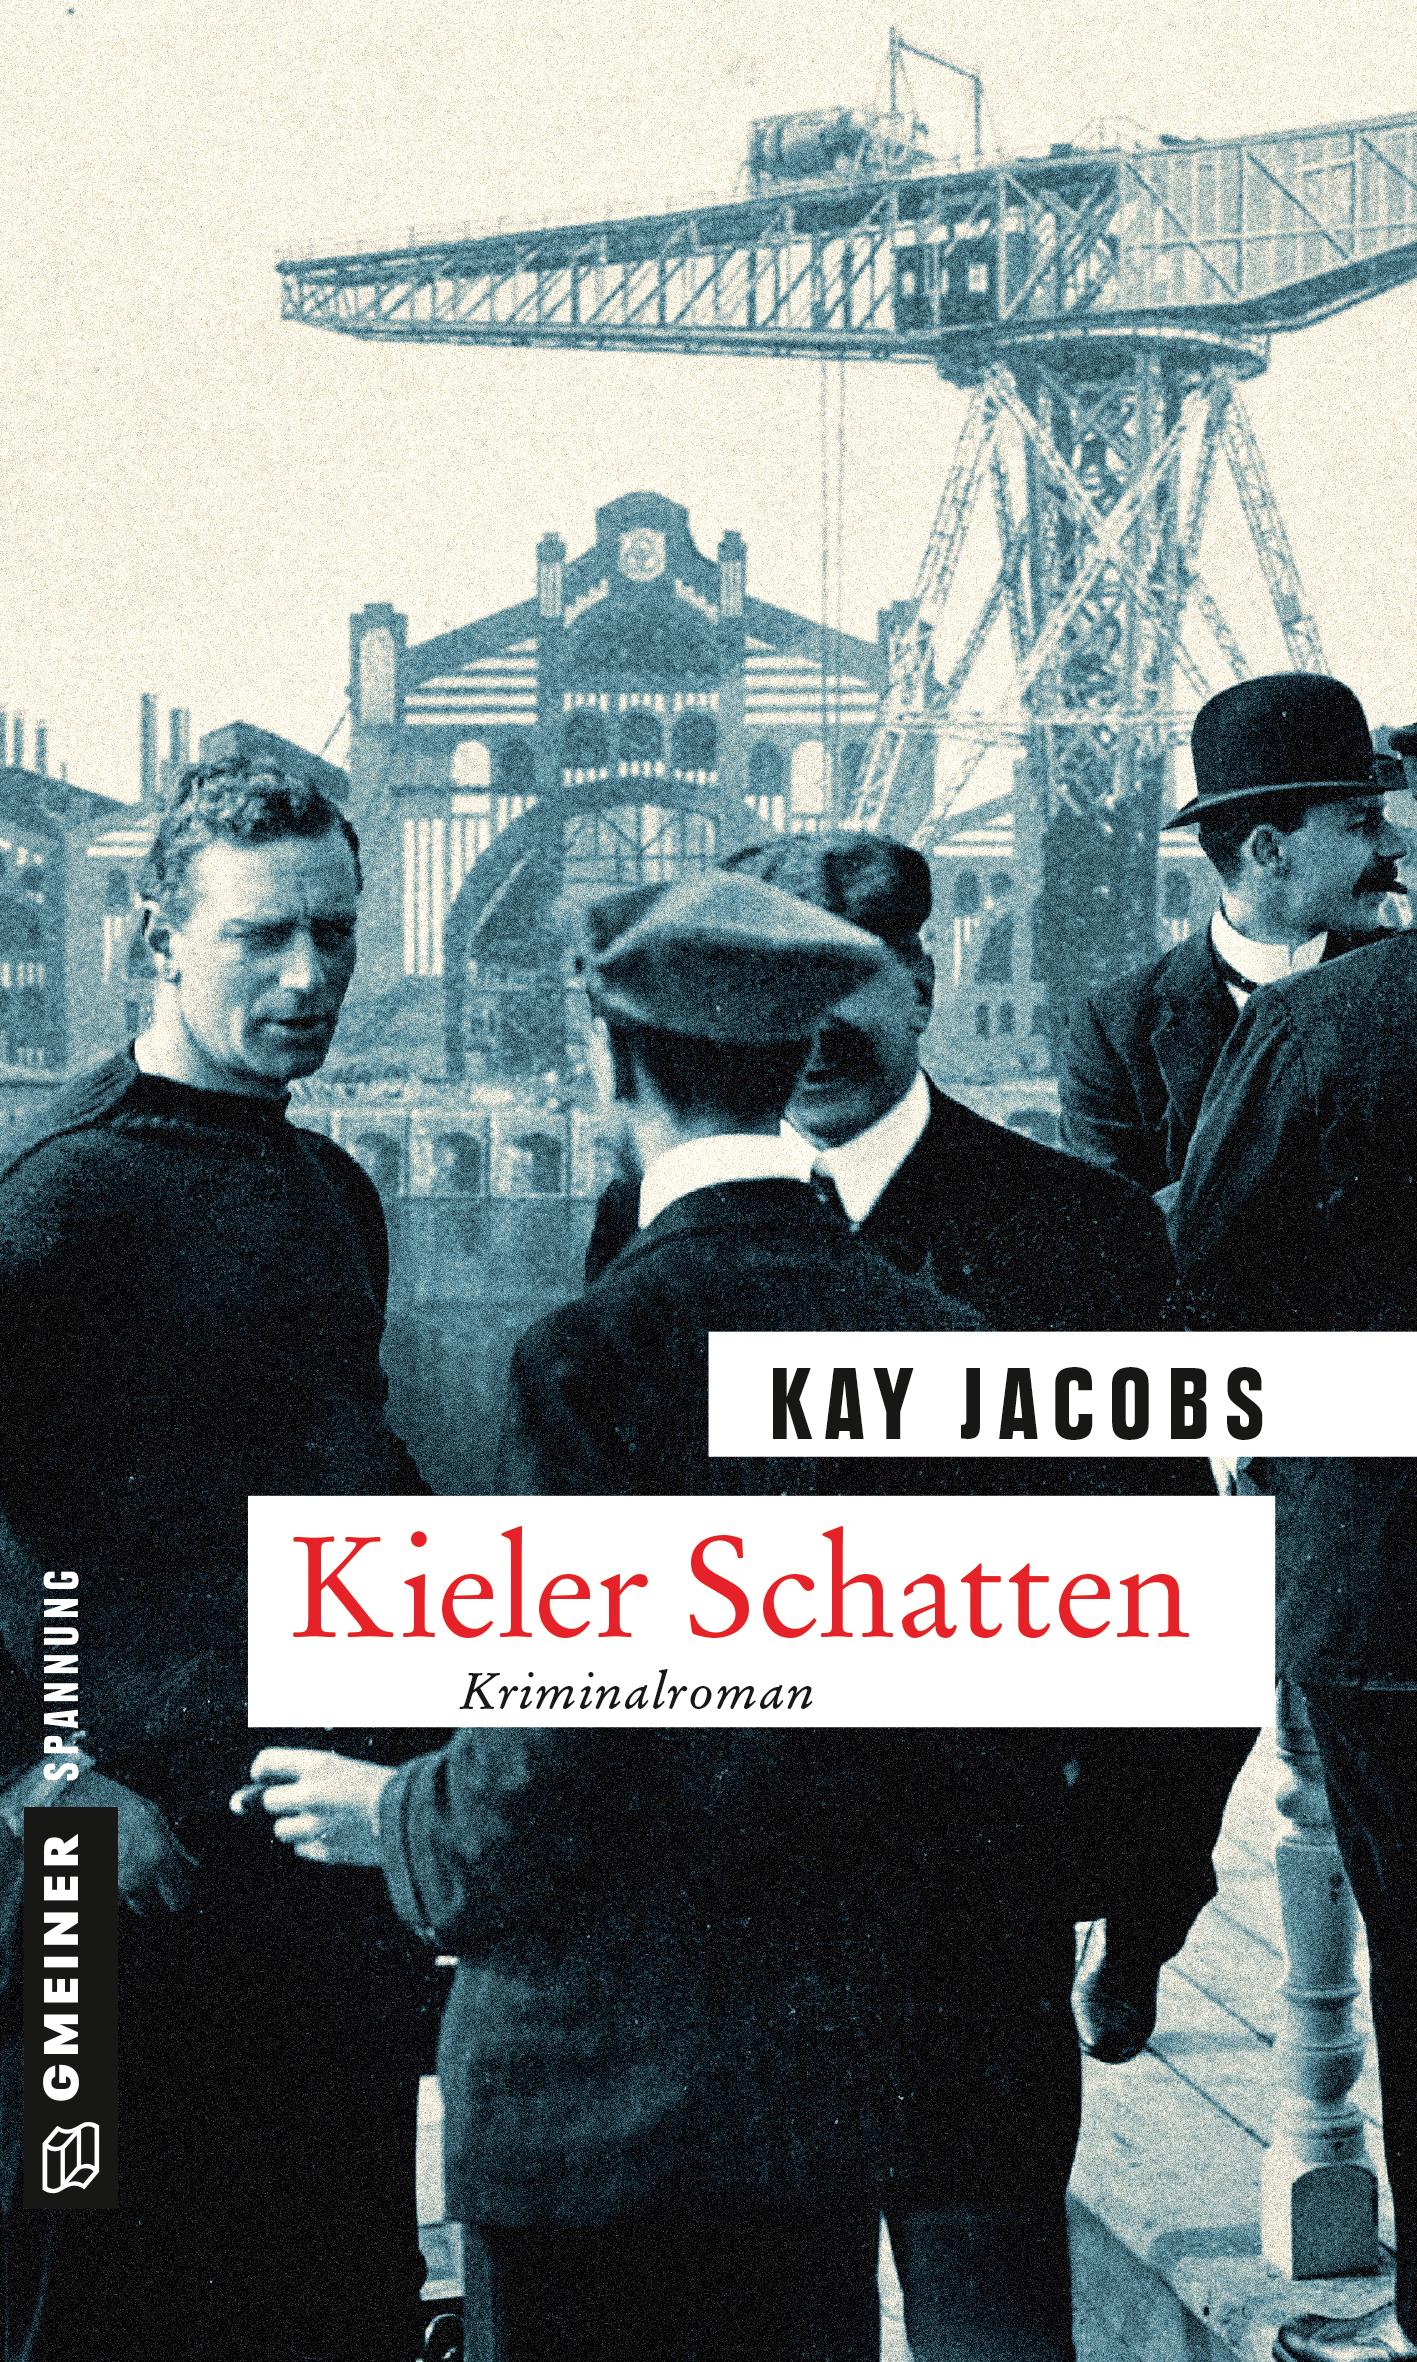 Kieler Schatten - Kay Jacobs [Broschiert]